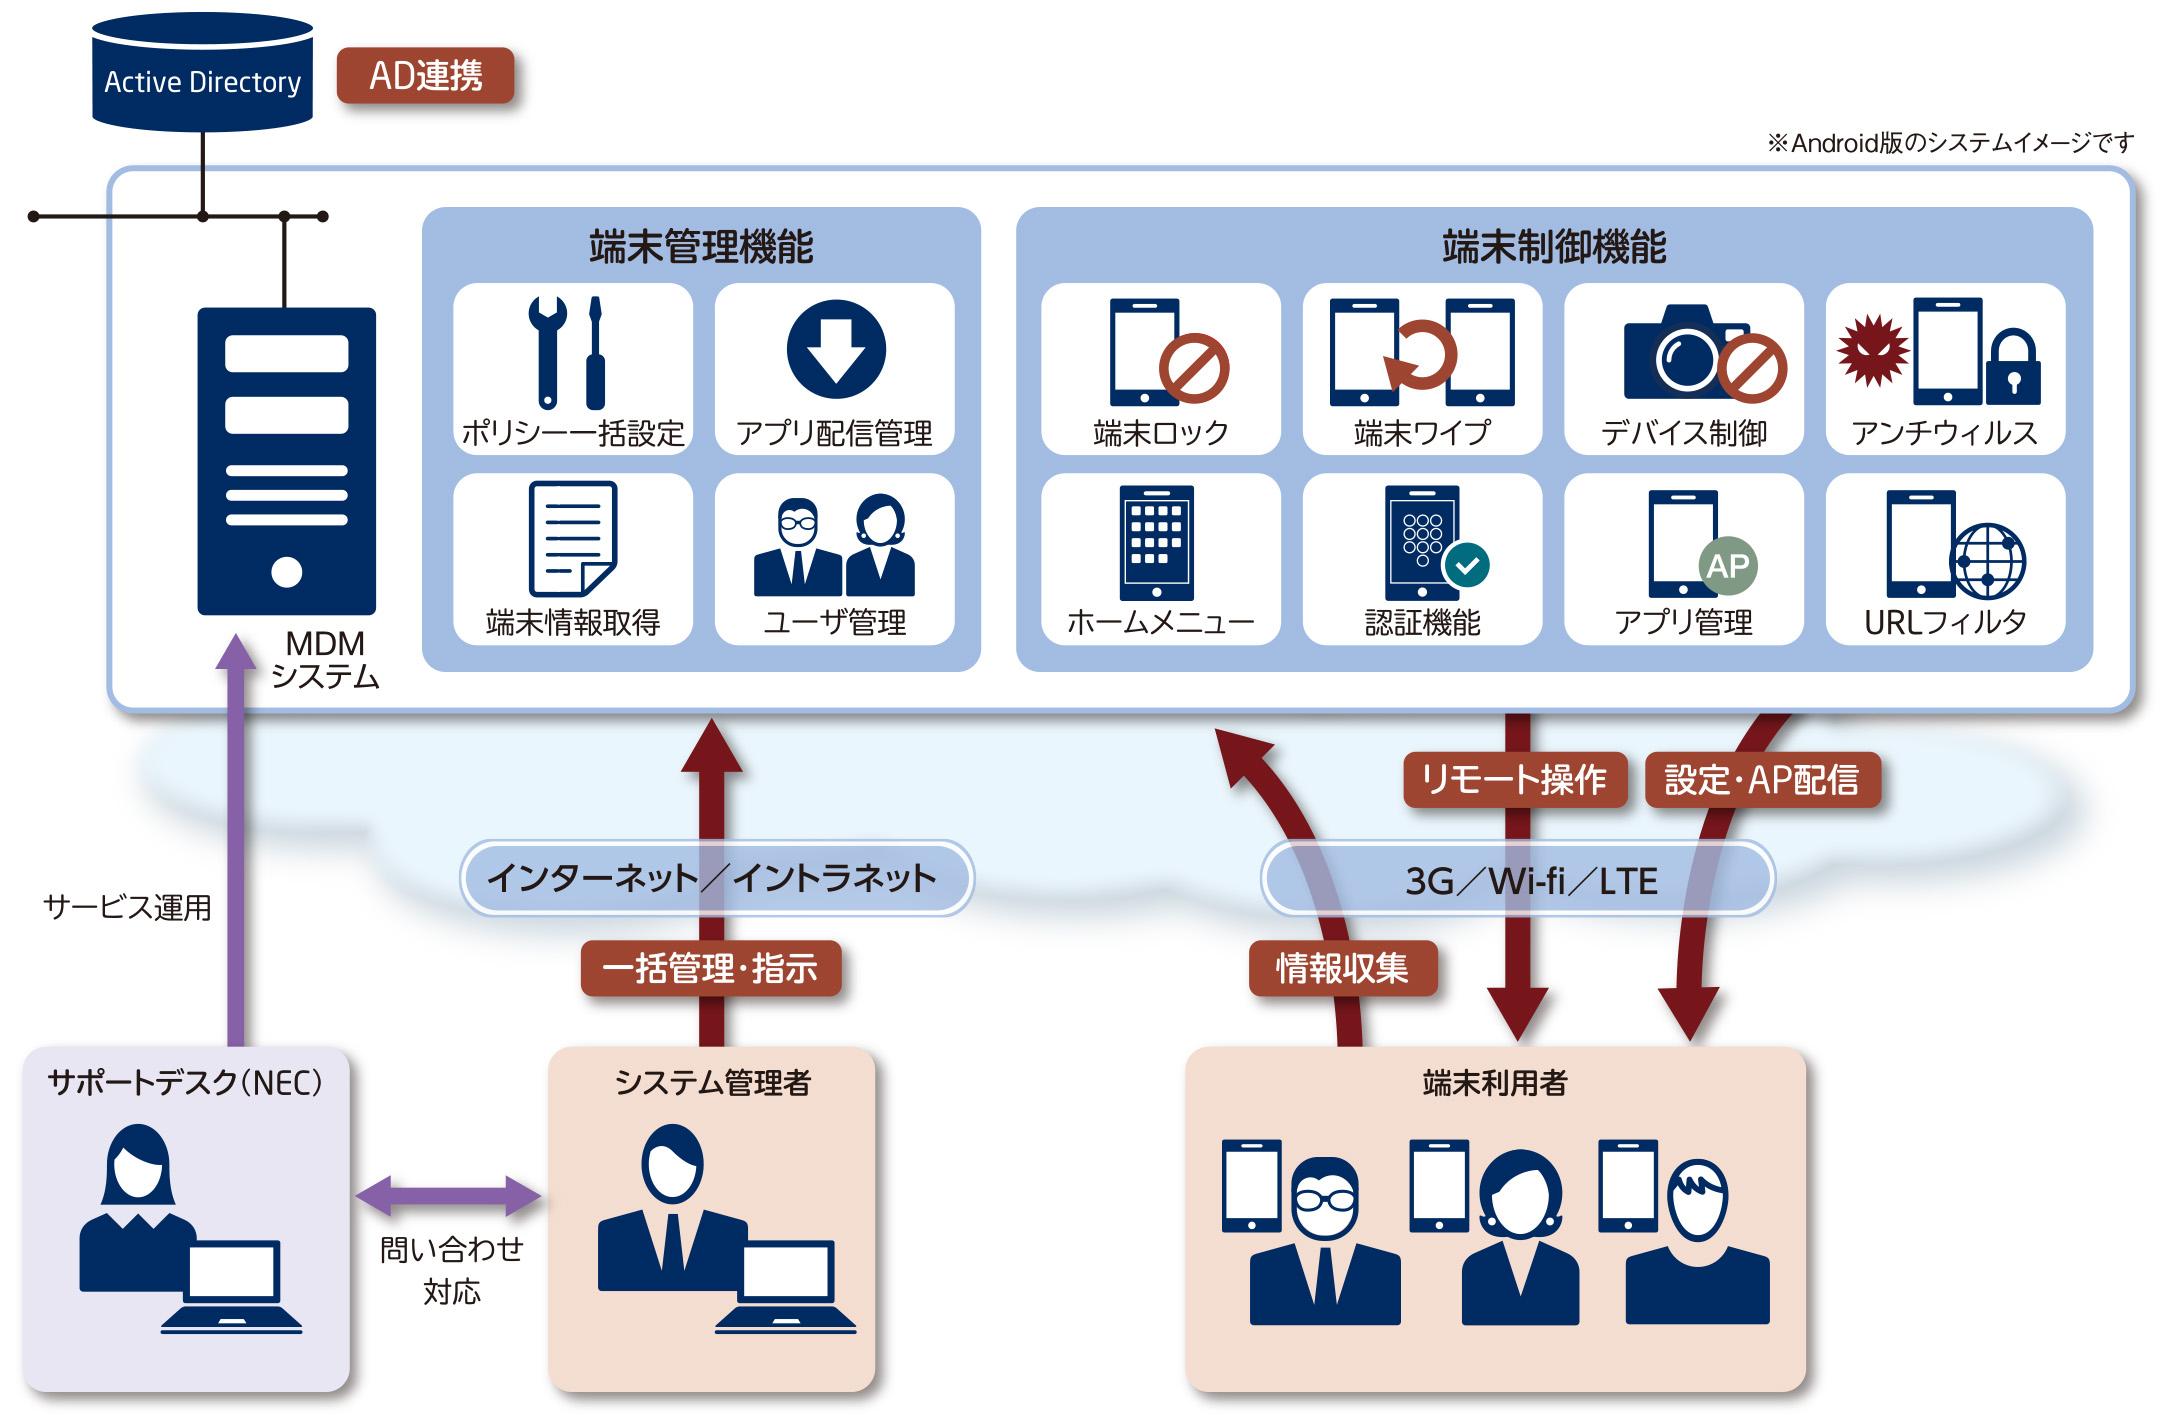 NECのクラウド型MDM 「スマートデバイス管理サービス」